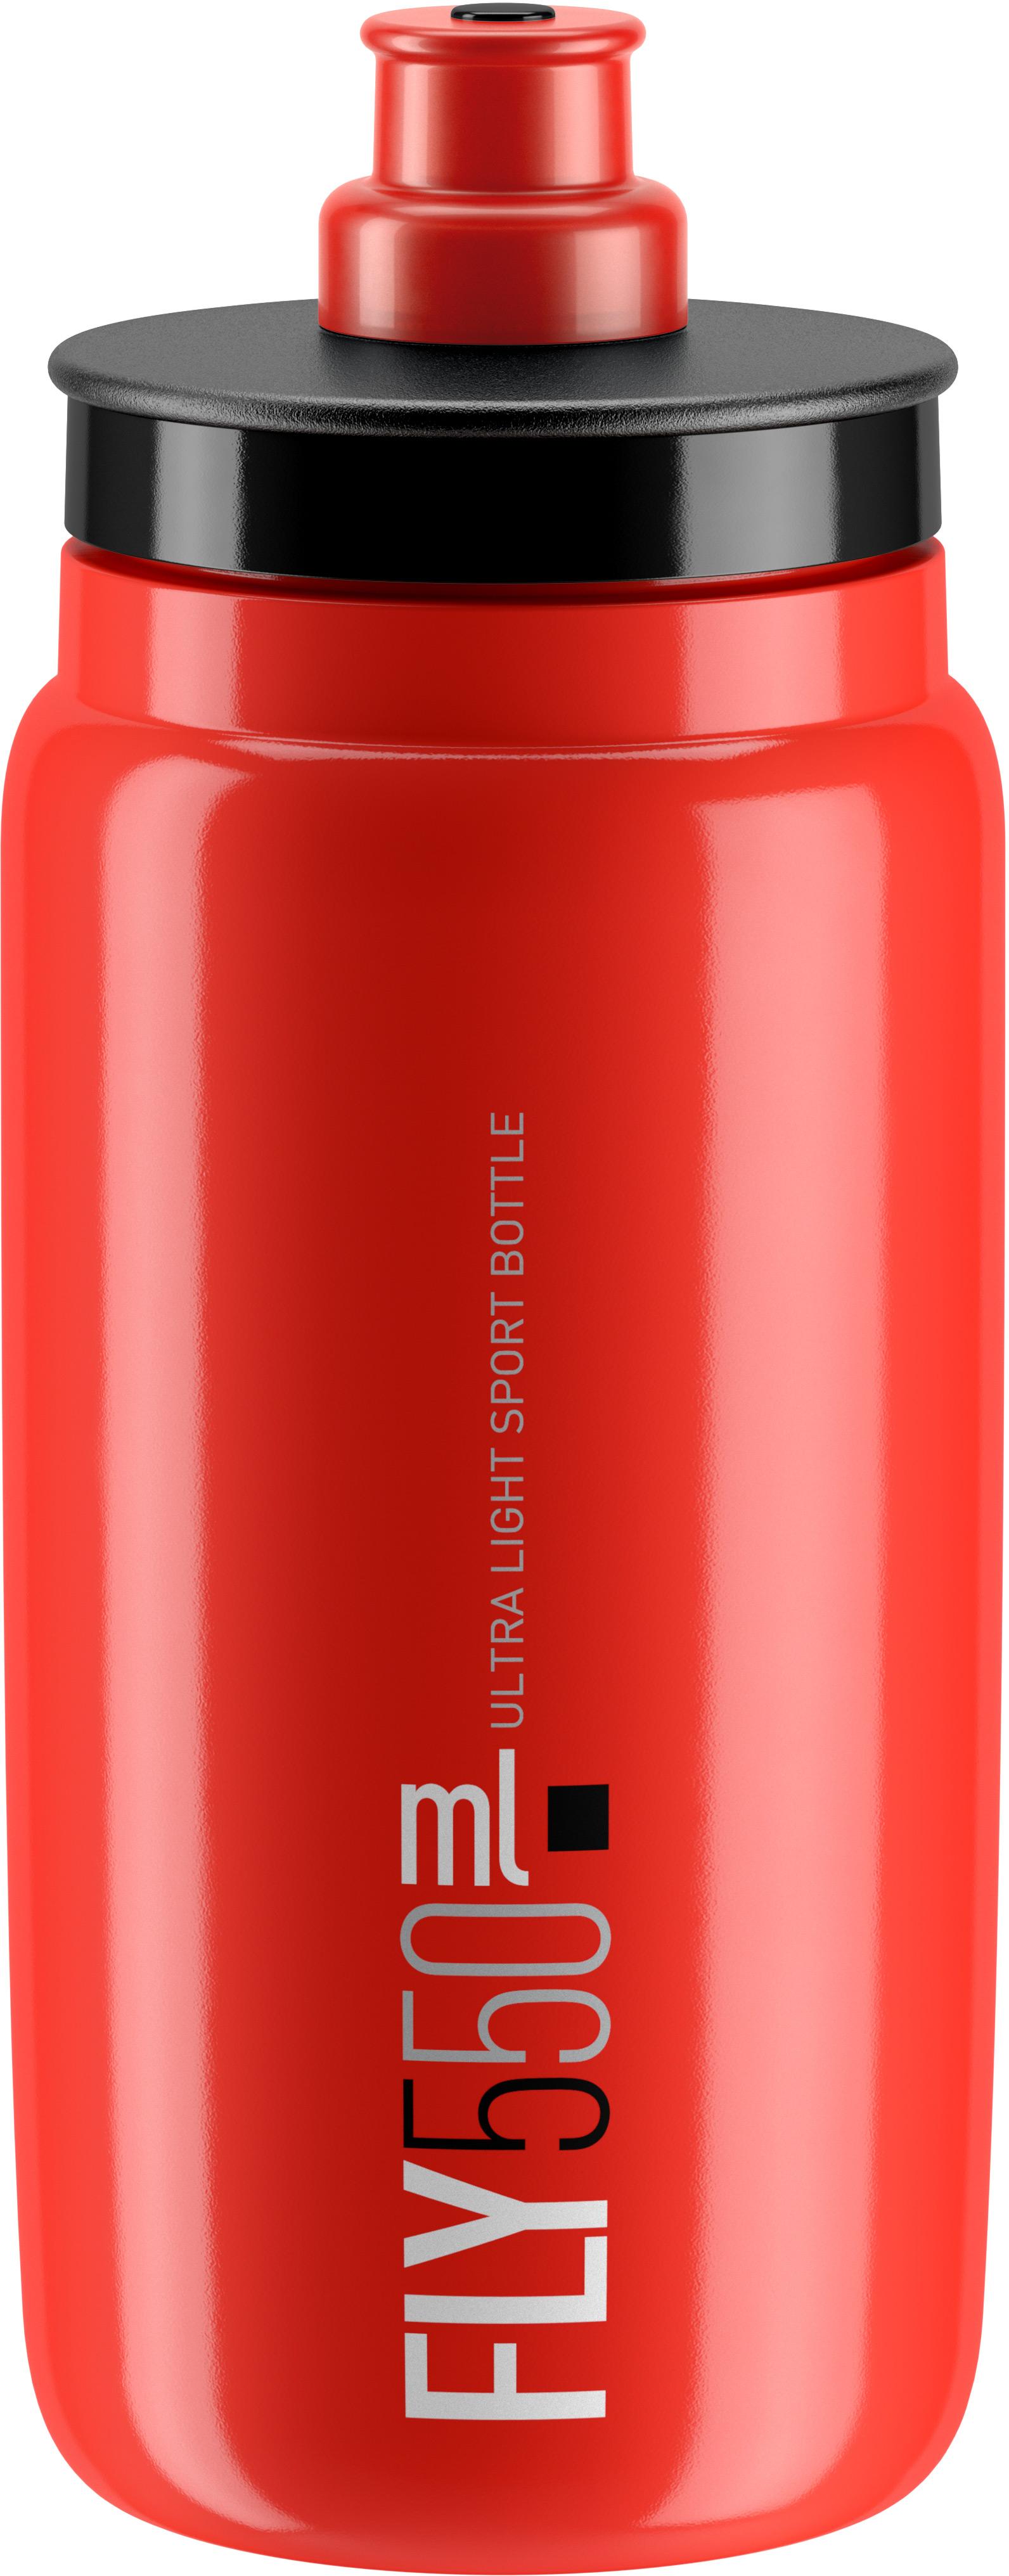 Endura Singletrack Lite Knee Protector Ii Tangerine